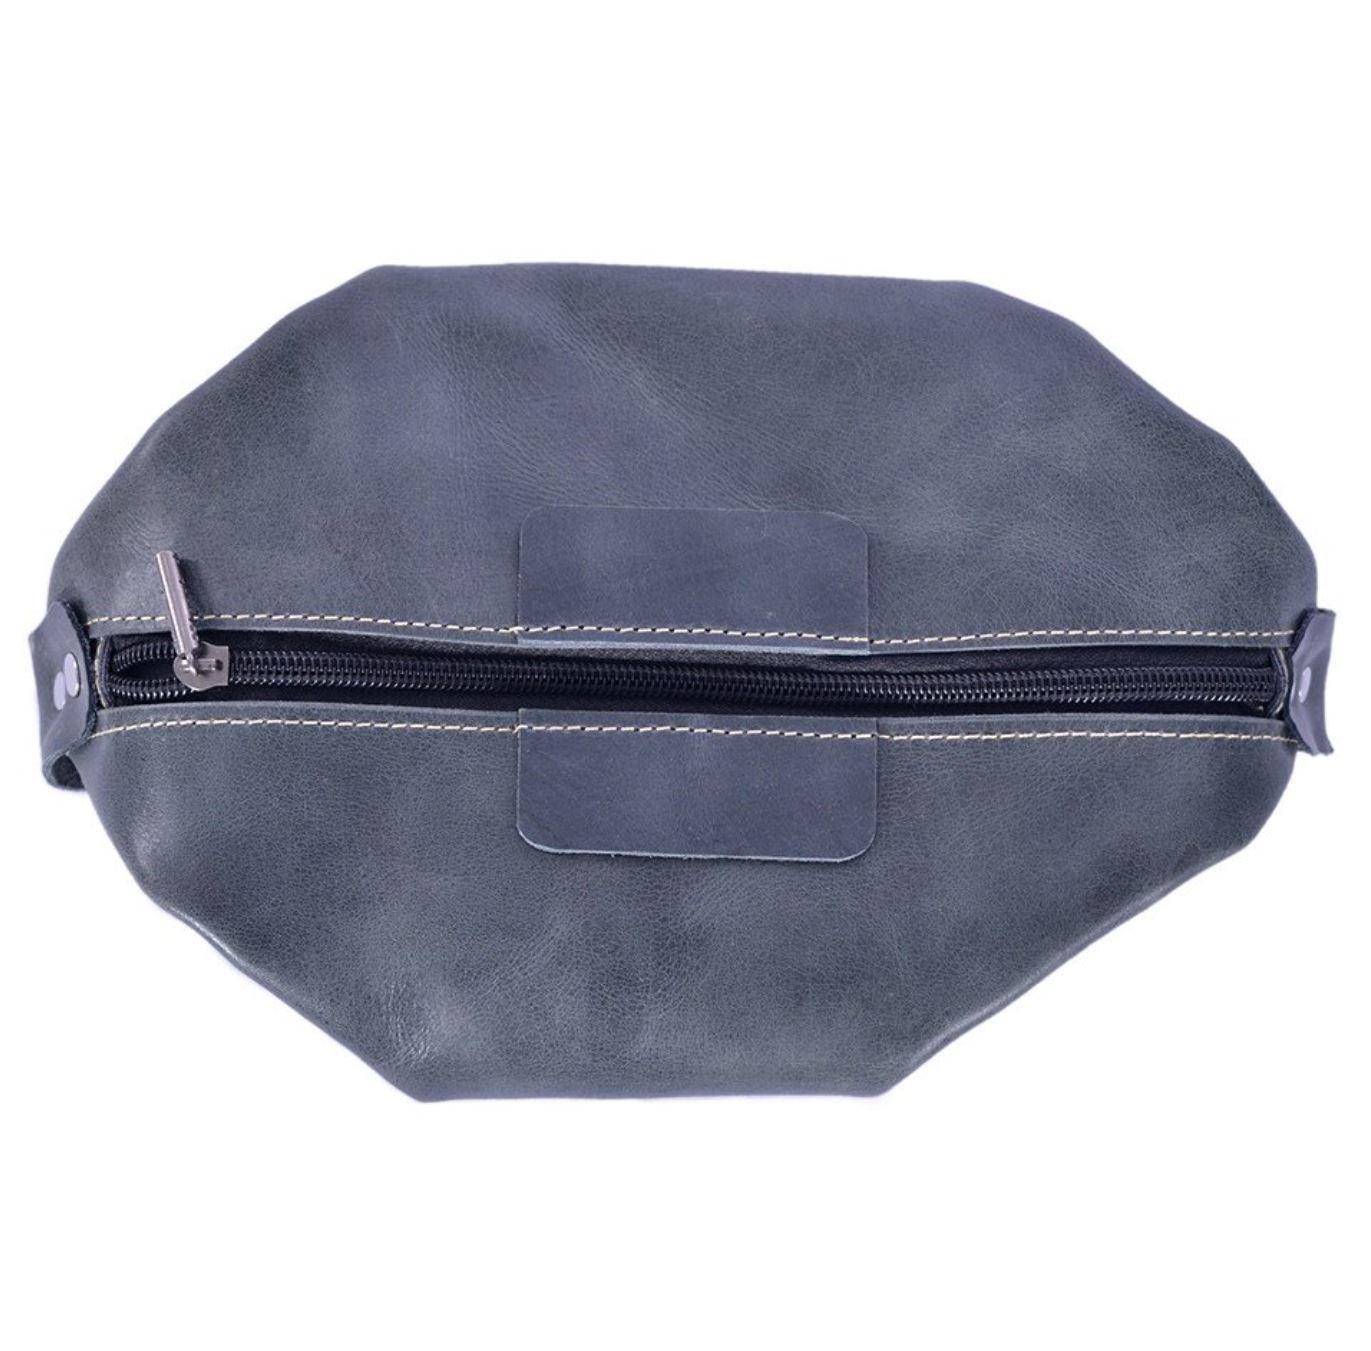 Travel Kit | Genuine Leather | Ethiopia